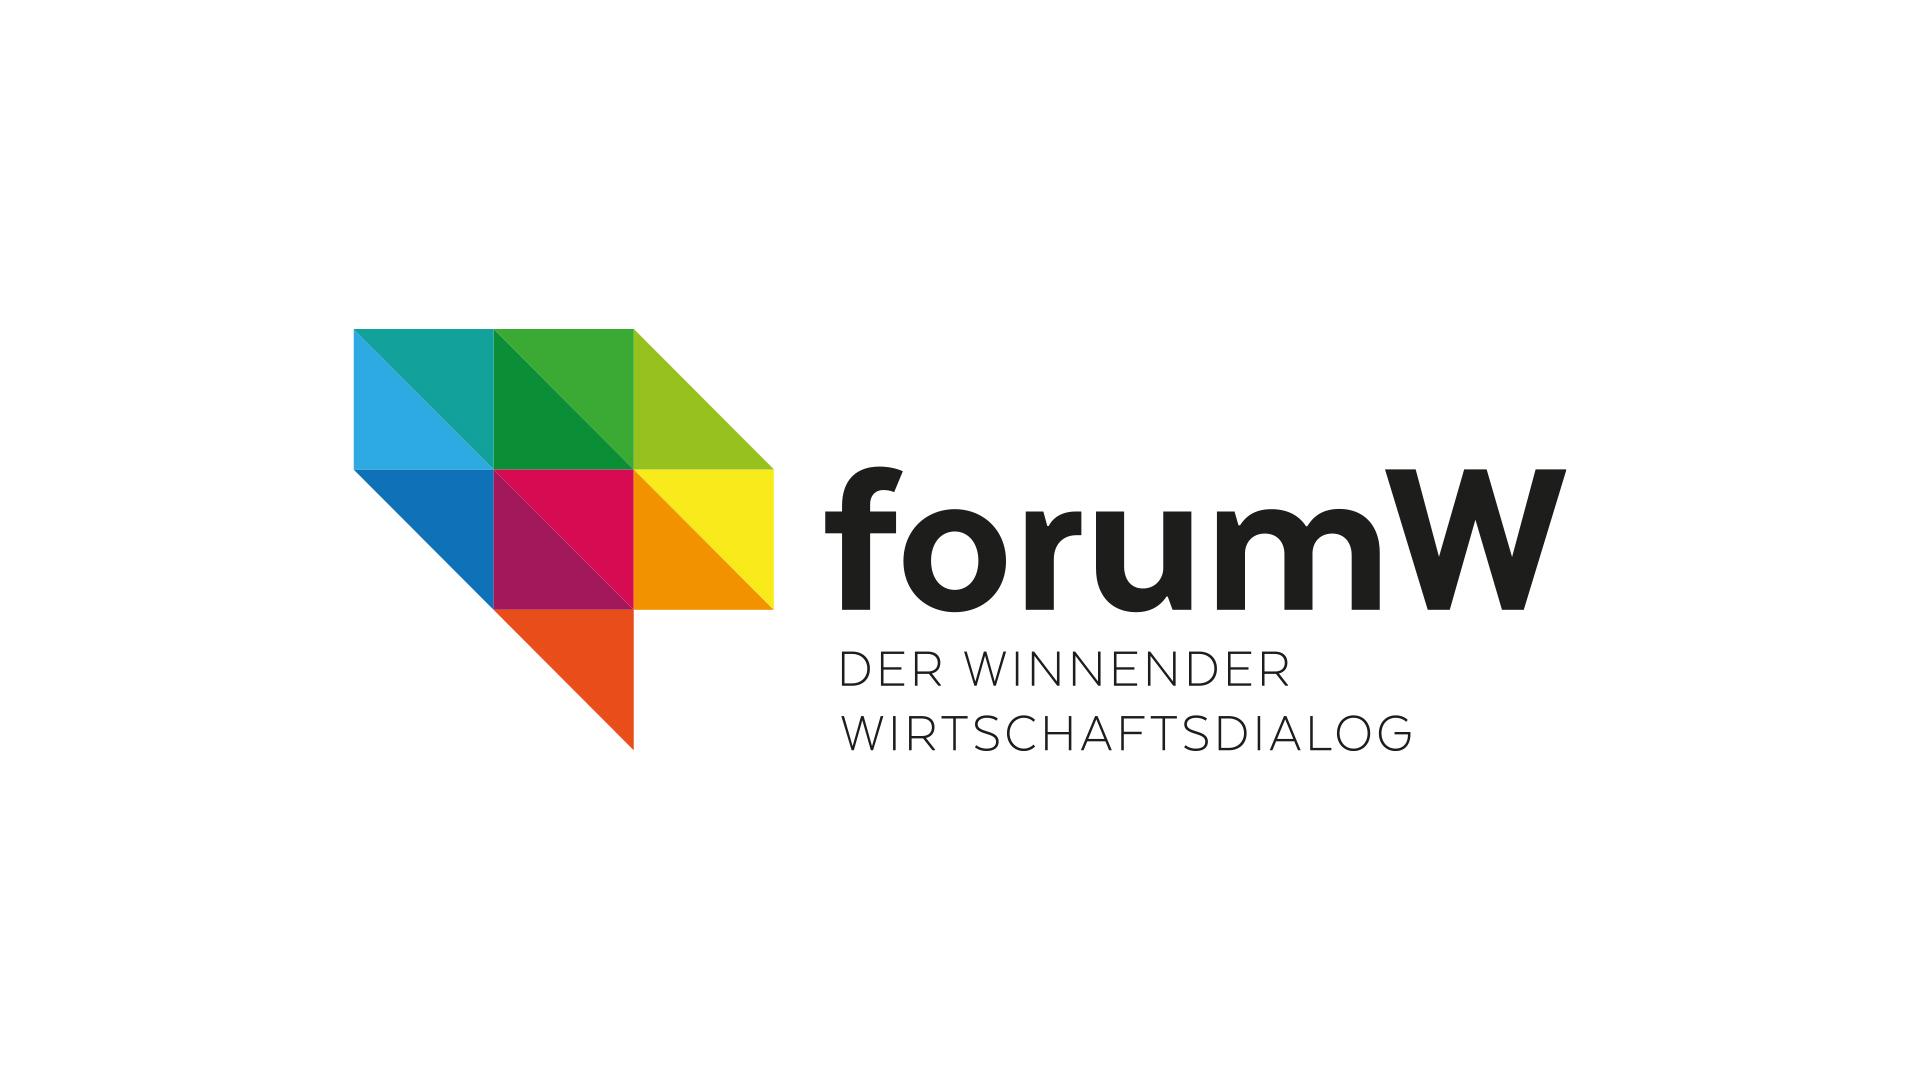 Pfleiderer Projektbau: Sponsoring ForumW